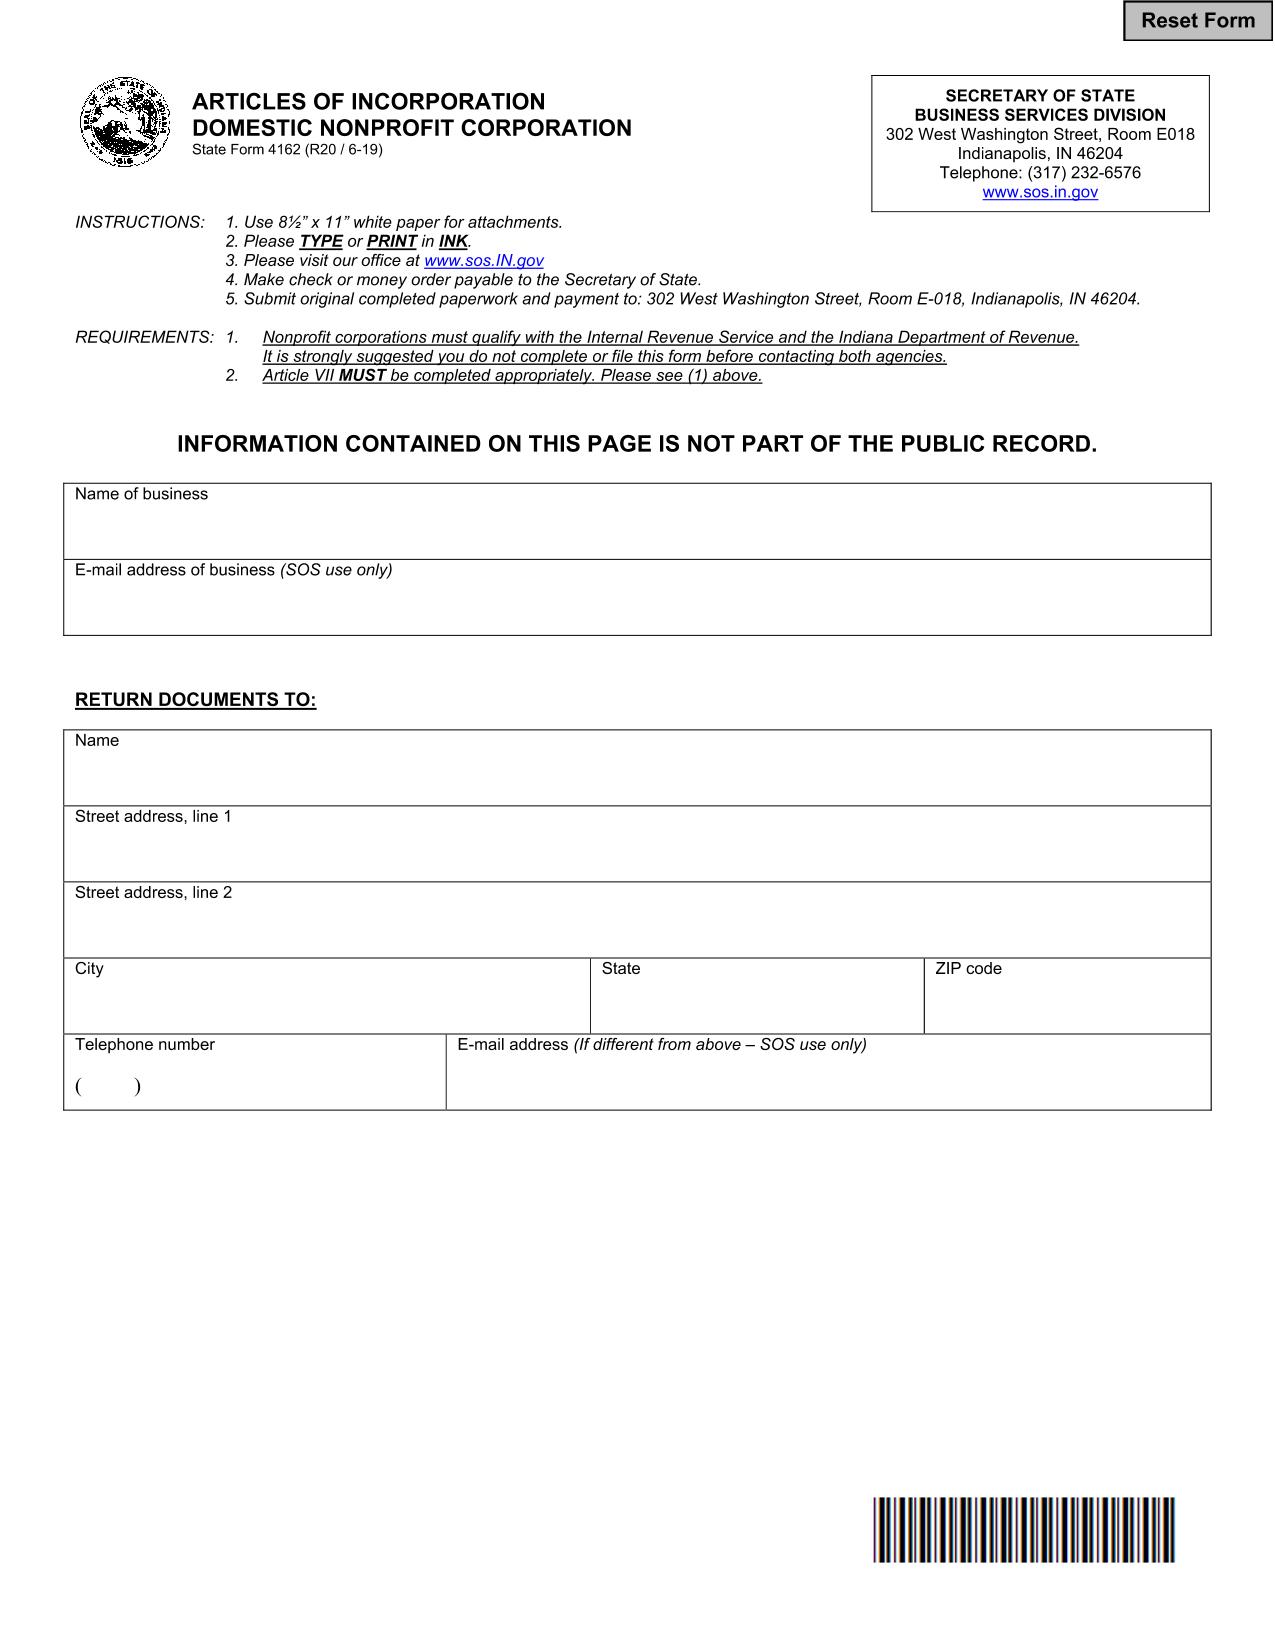 Indiana Articles of Incorporation Domestic Nonprofit Corporation